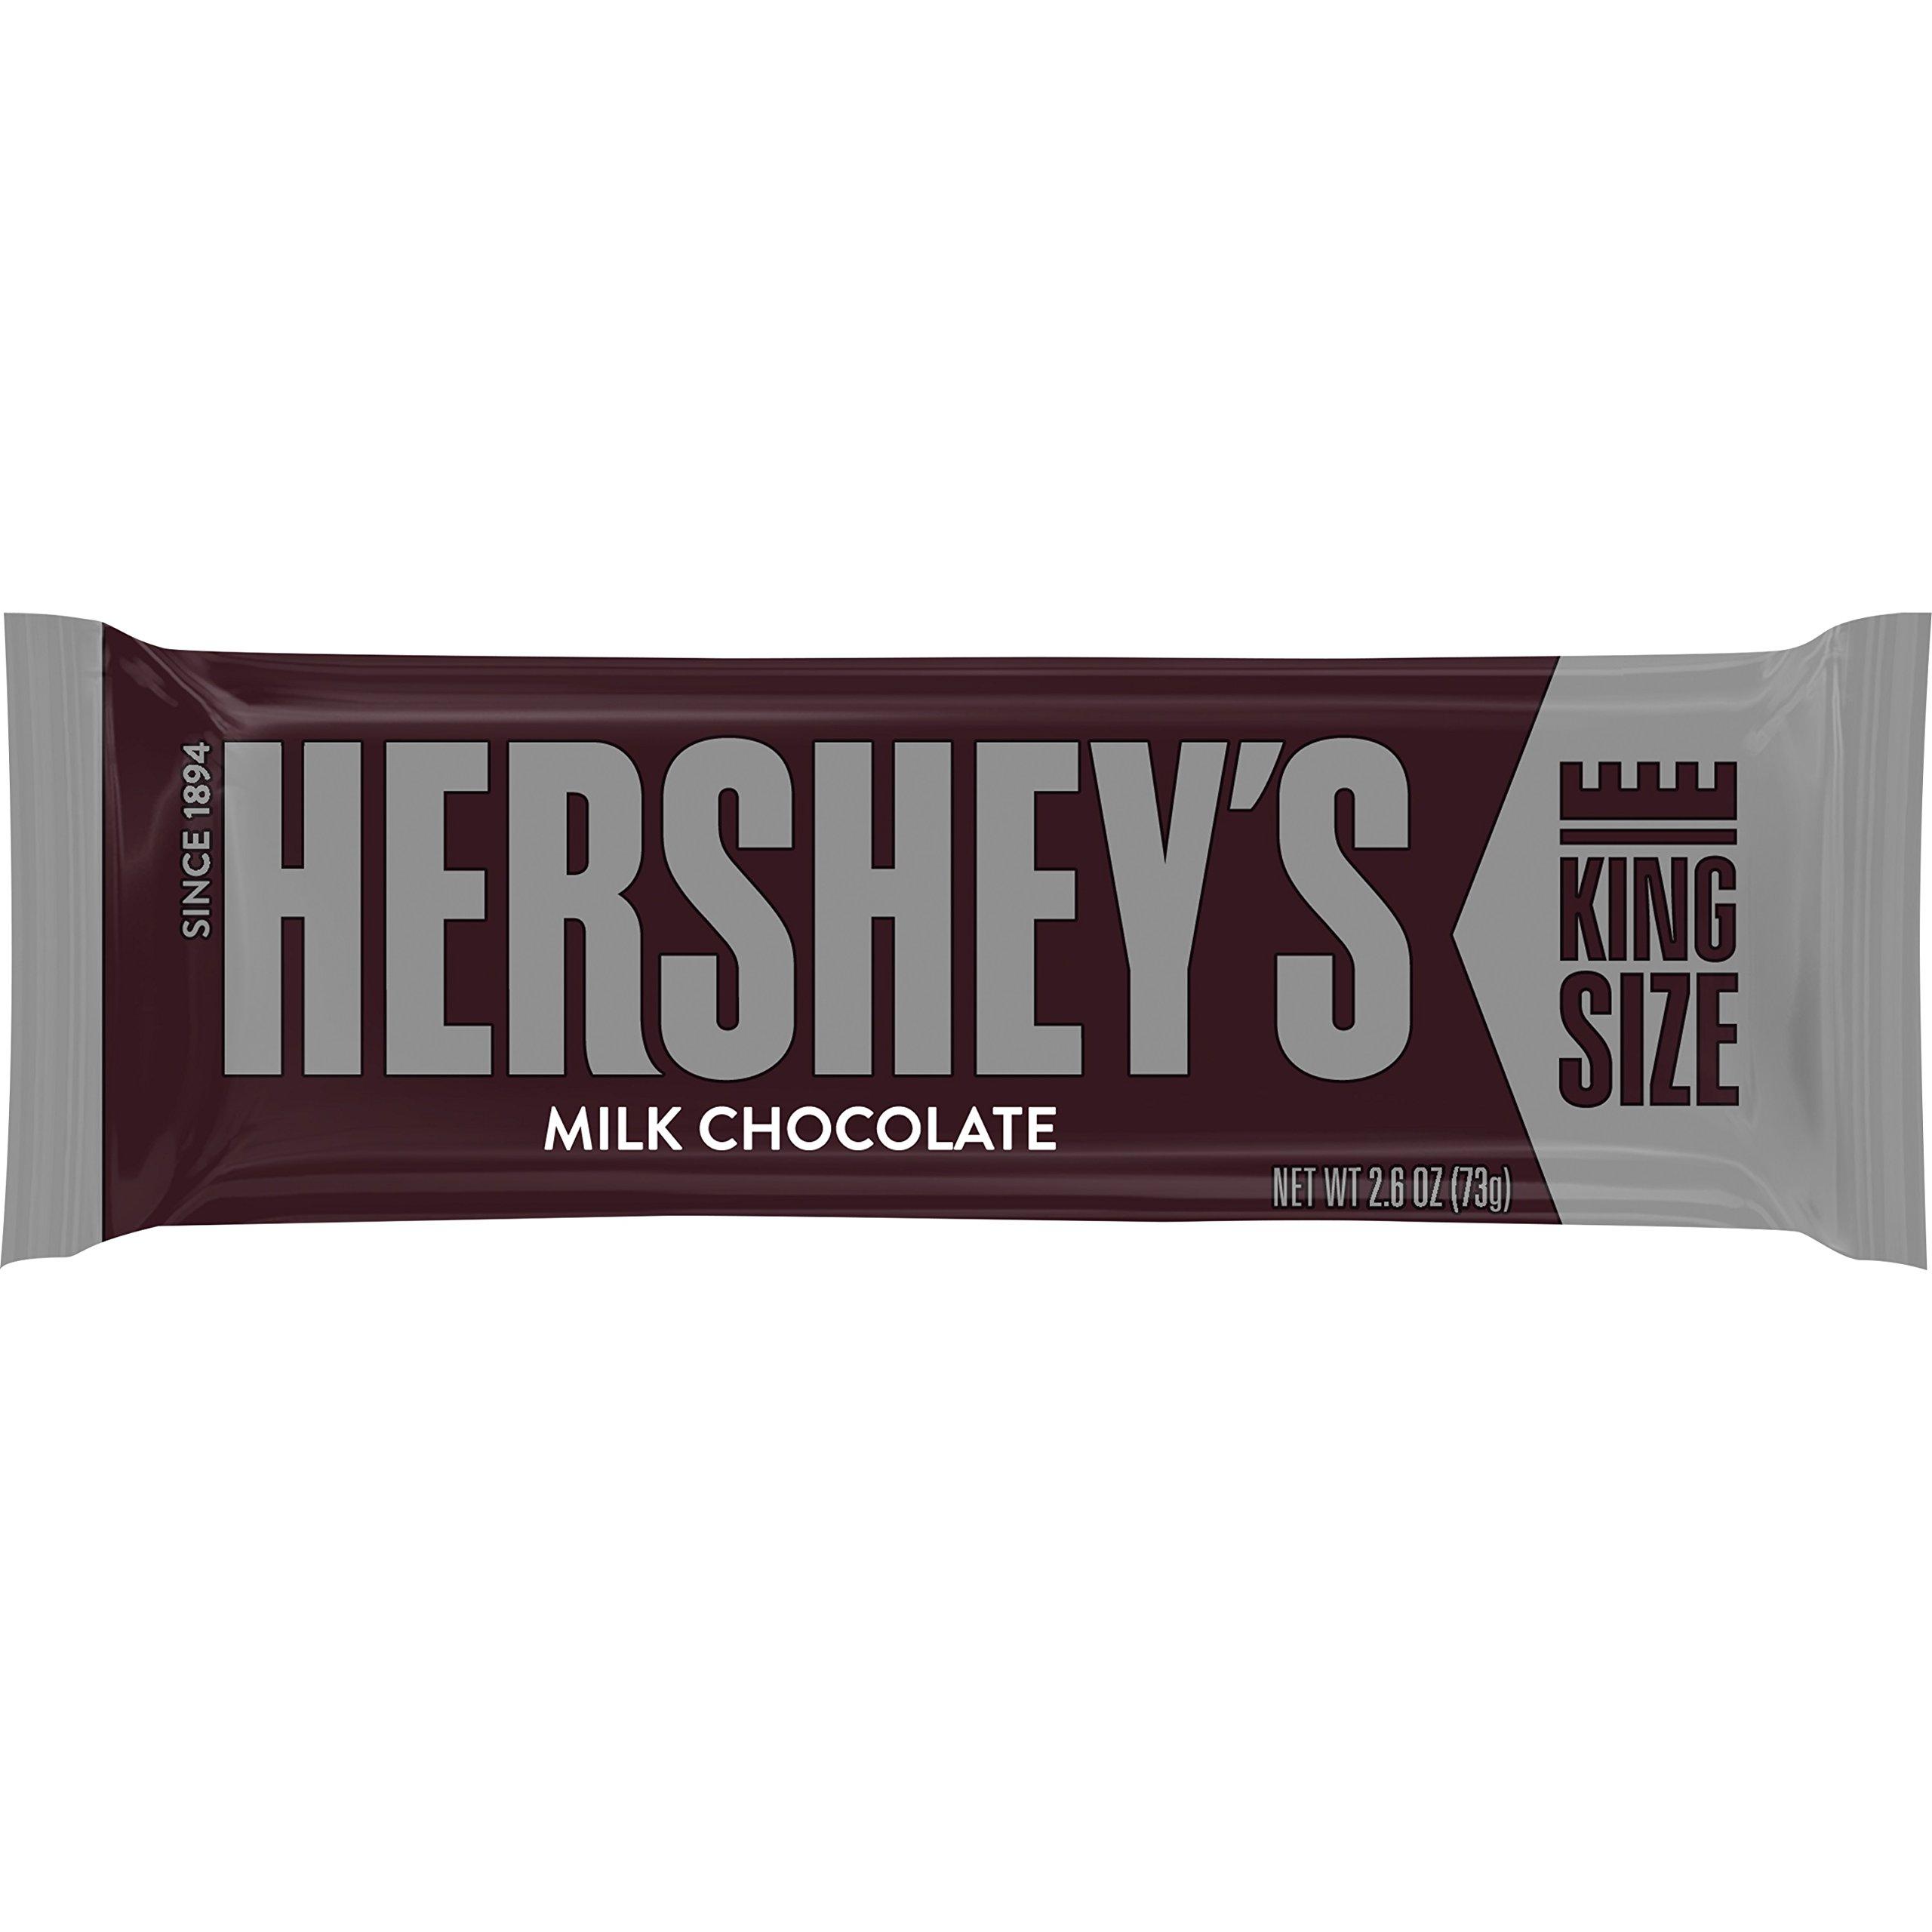 HERSHEY'S King Size Milk Chocolate Bar, 2.6 Ounce